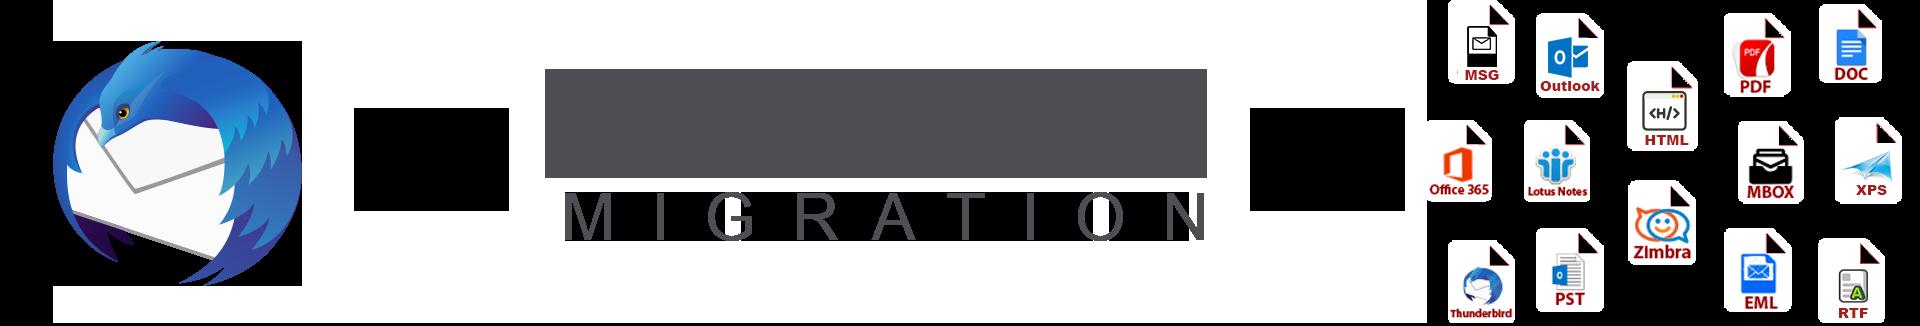 Thunderbird Migration Tool - Export Thunderbird Emails to